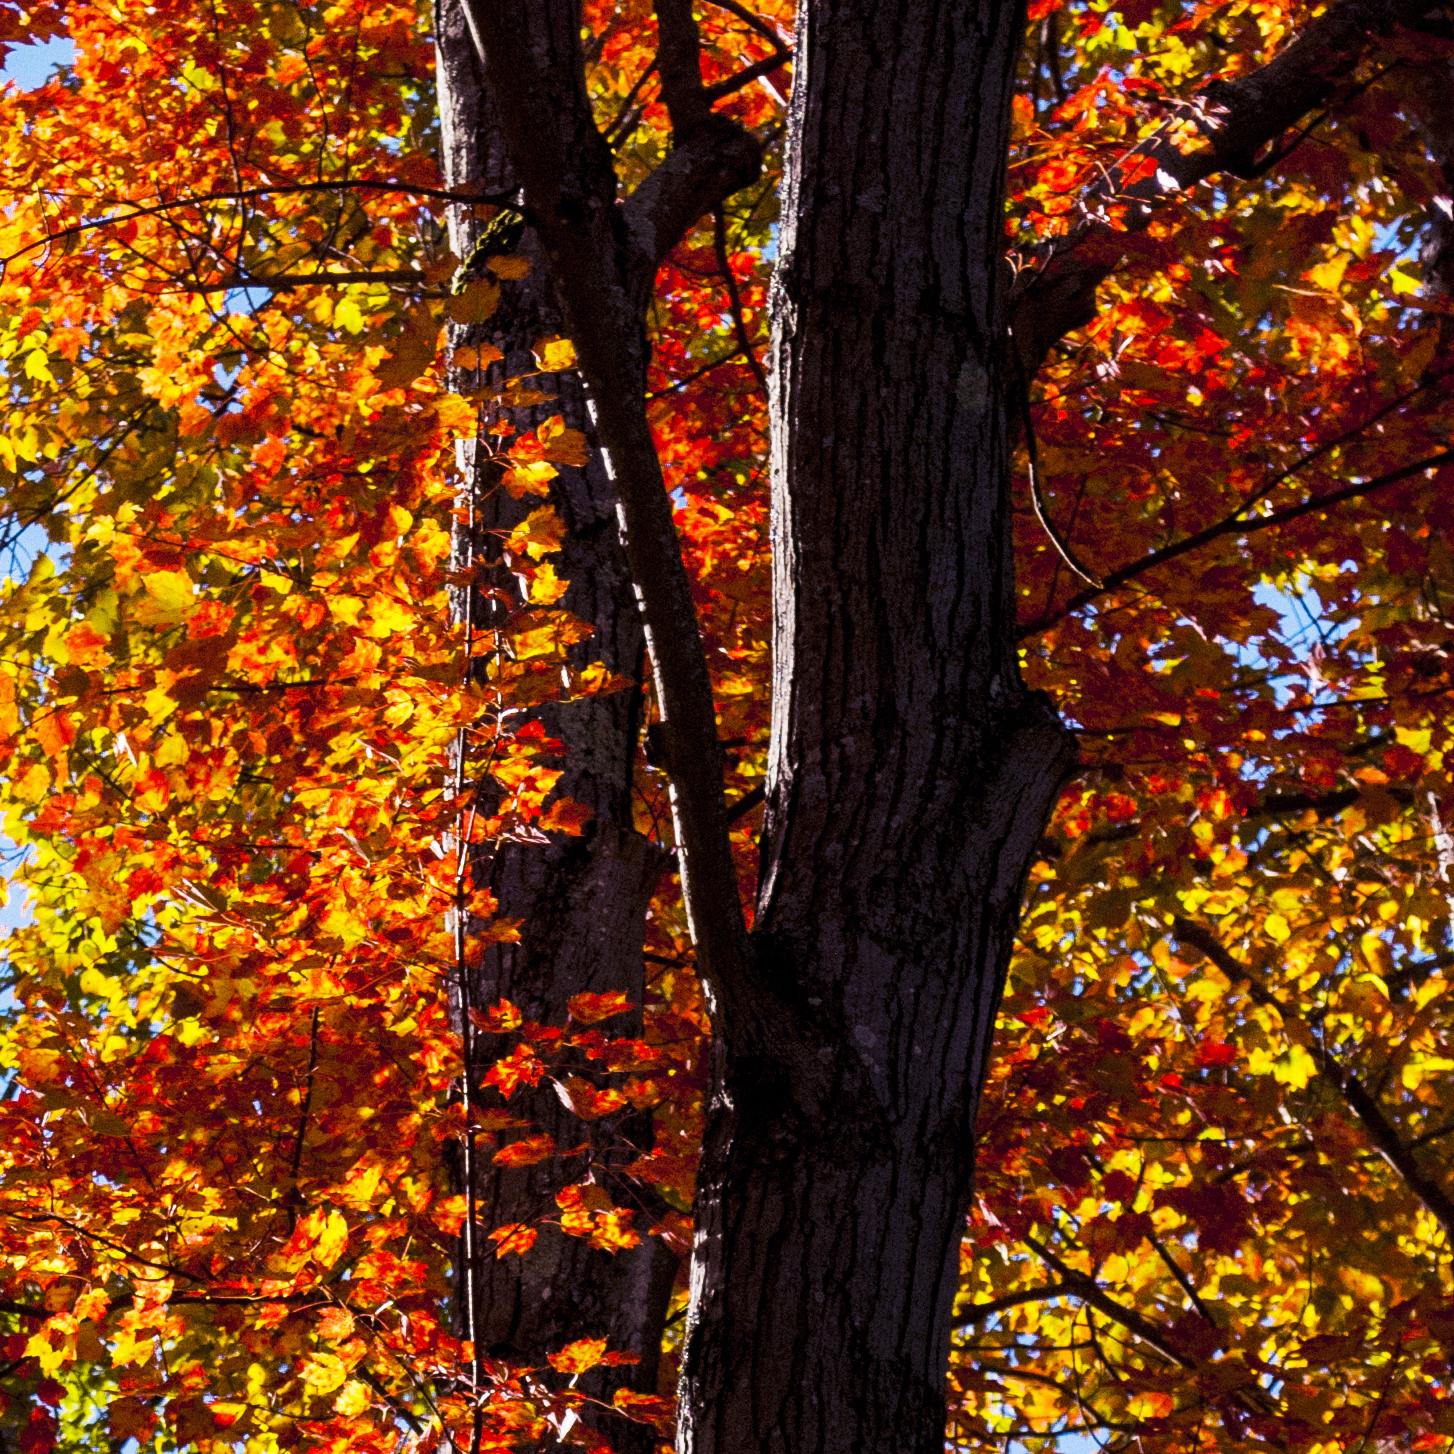 backlit red maple leaves glowing against shadowed bark